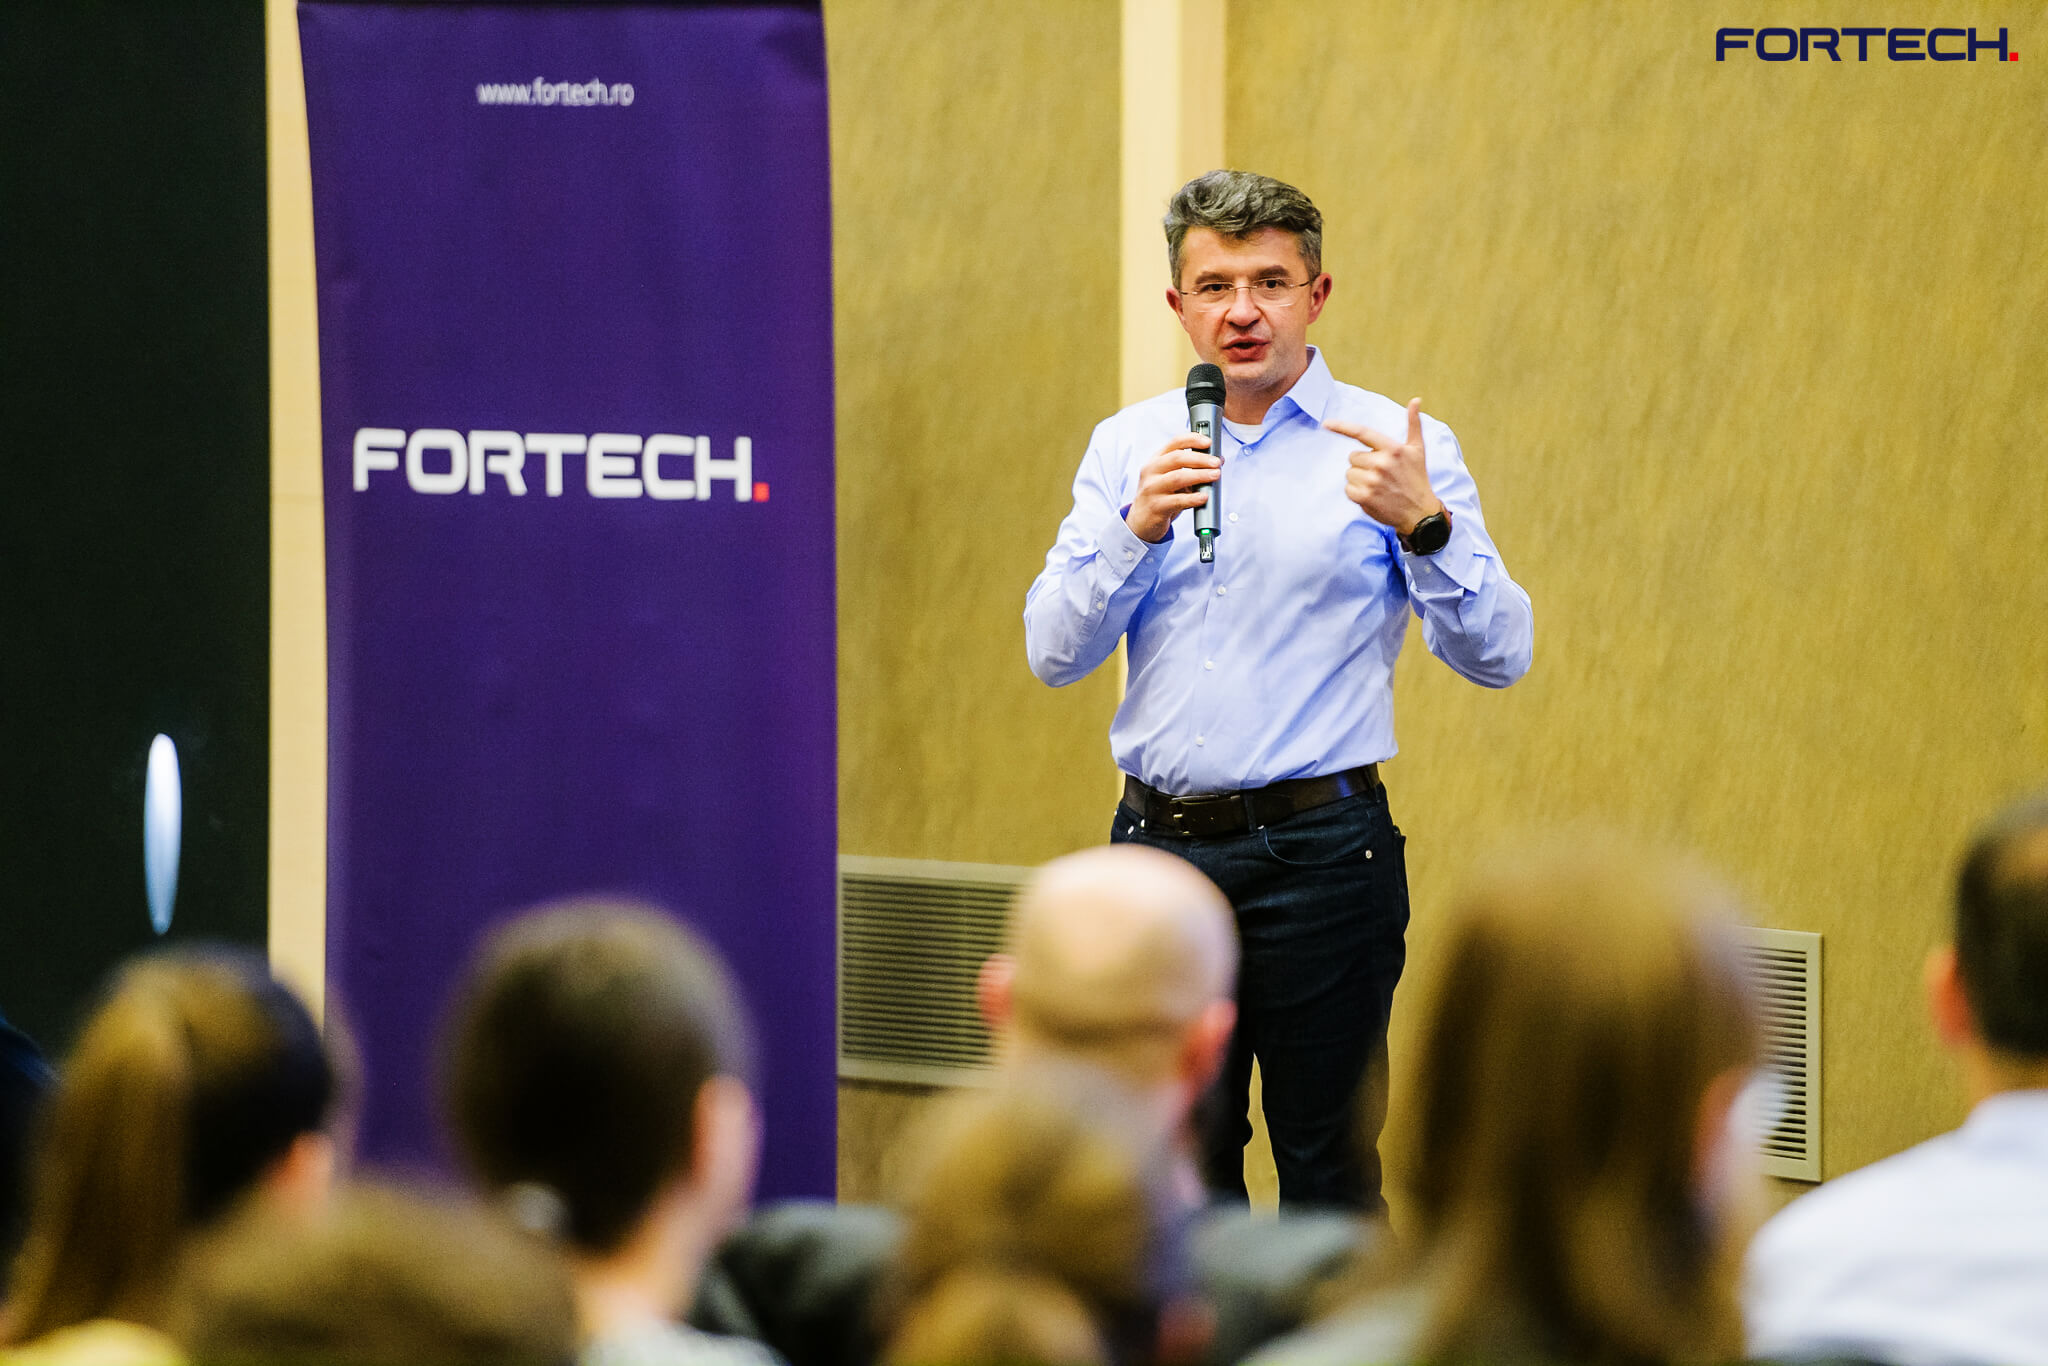 Calin Vaduva, Fortech CEO, Speaker at Techsylvania 2019